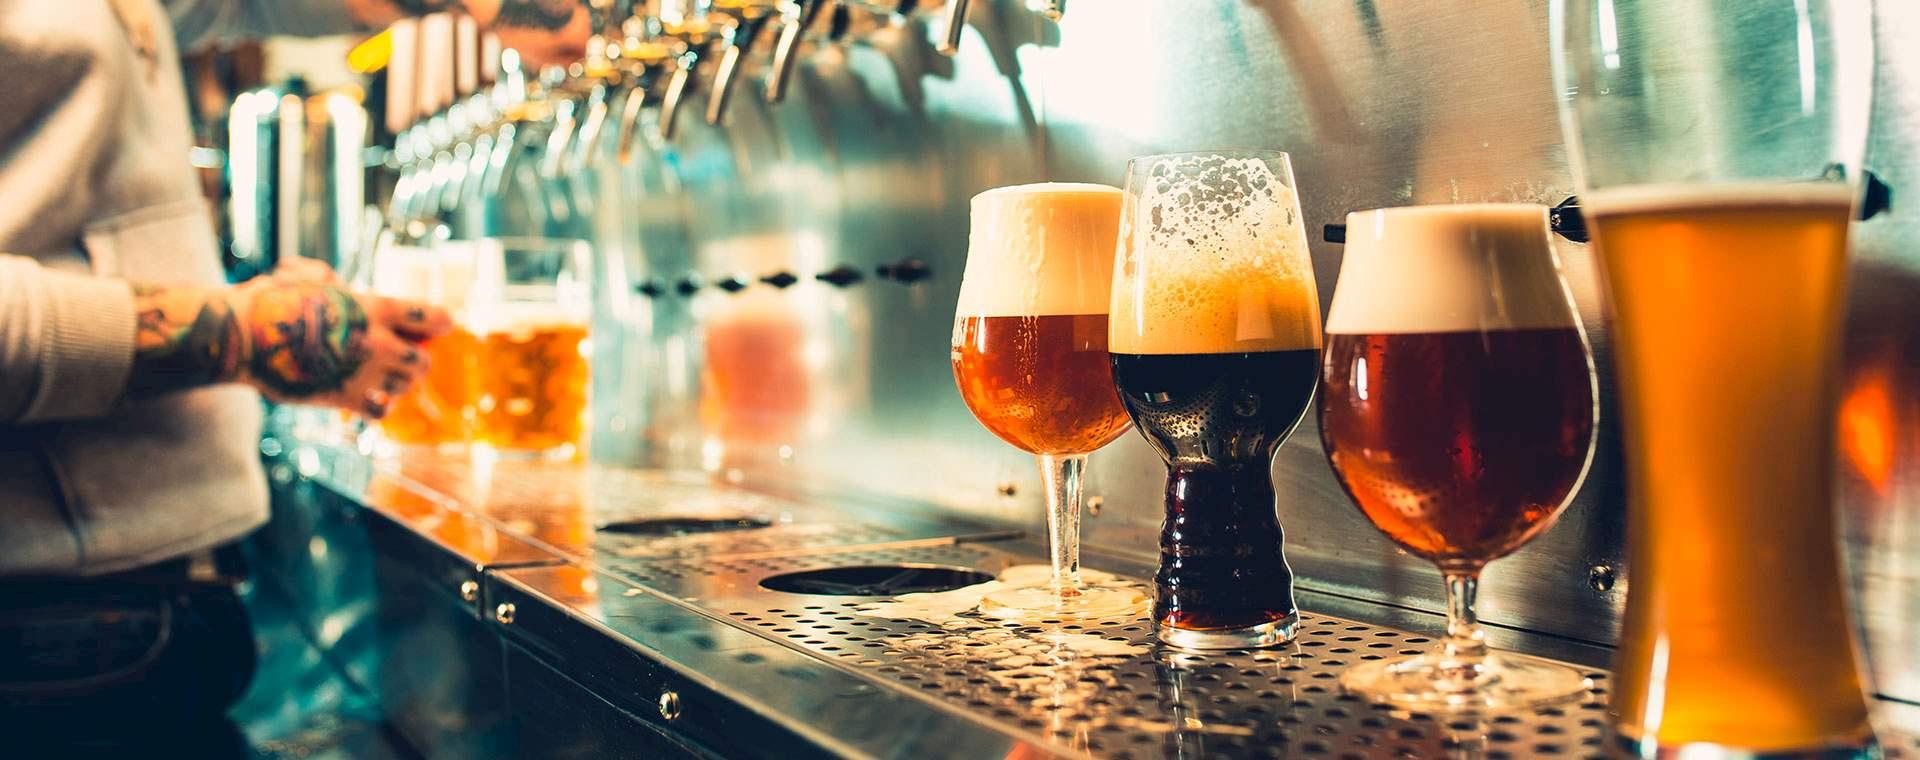 Birmingham Al Restaurant The Lab Bar And Kitchen